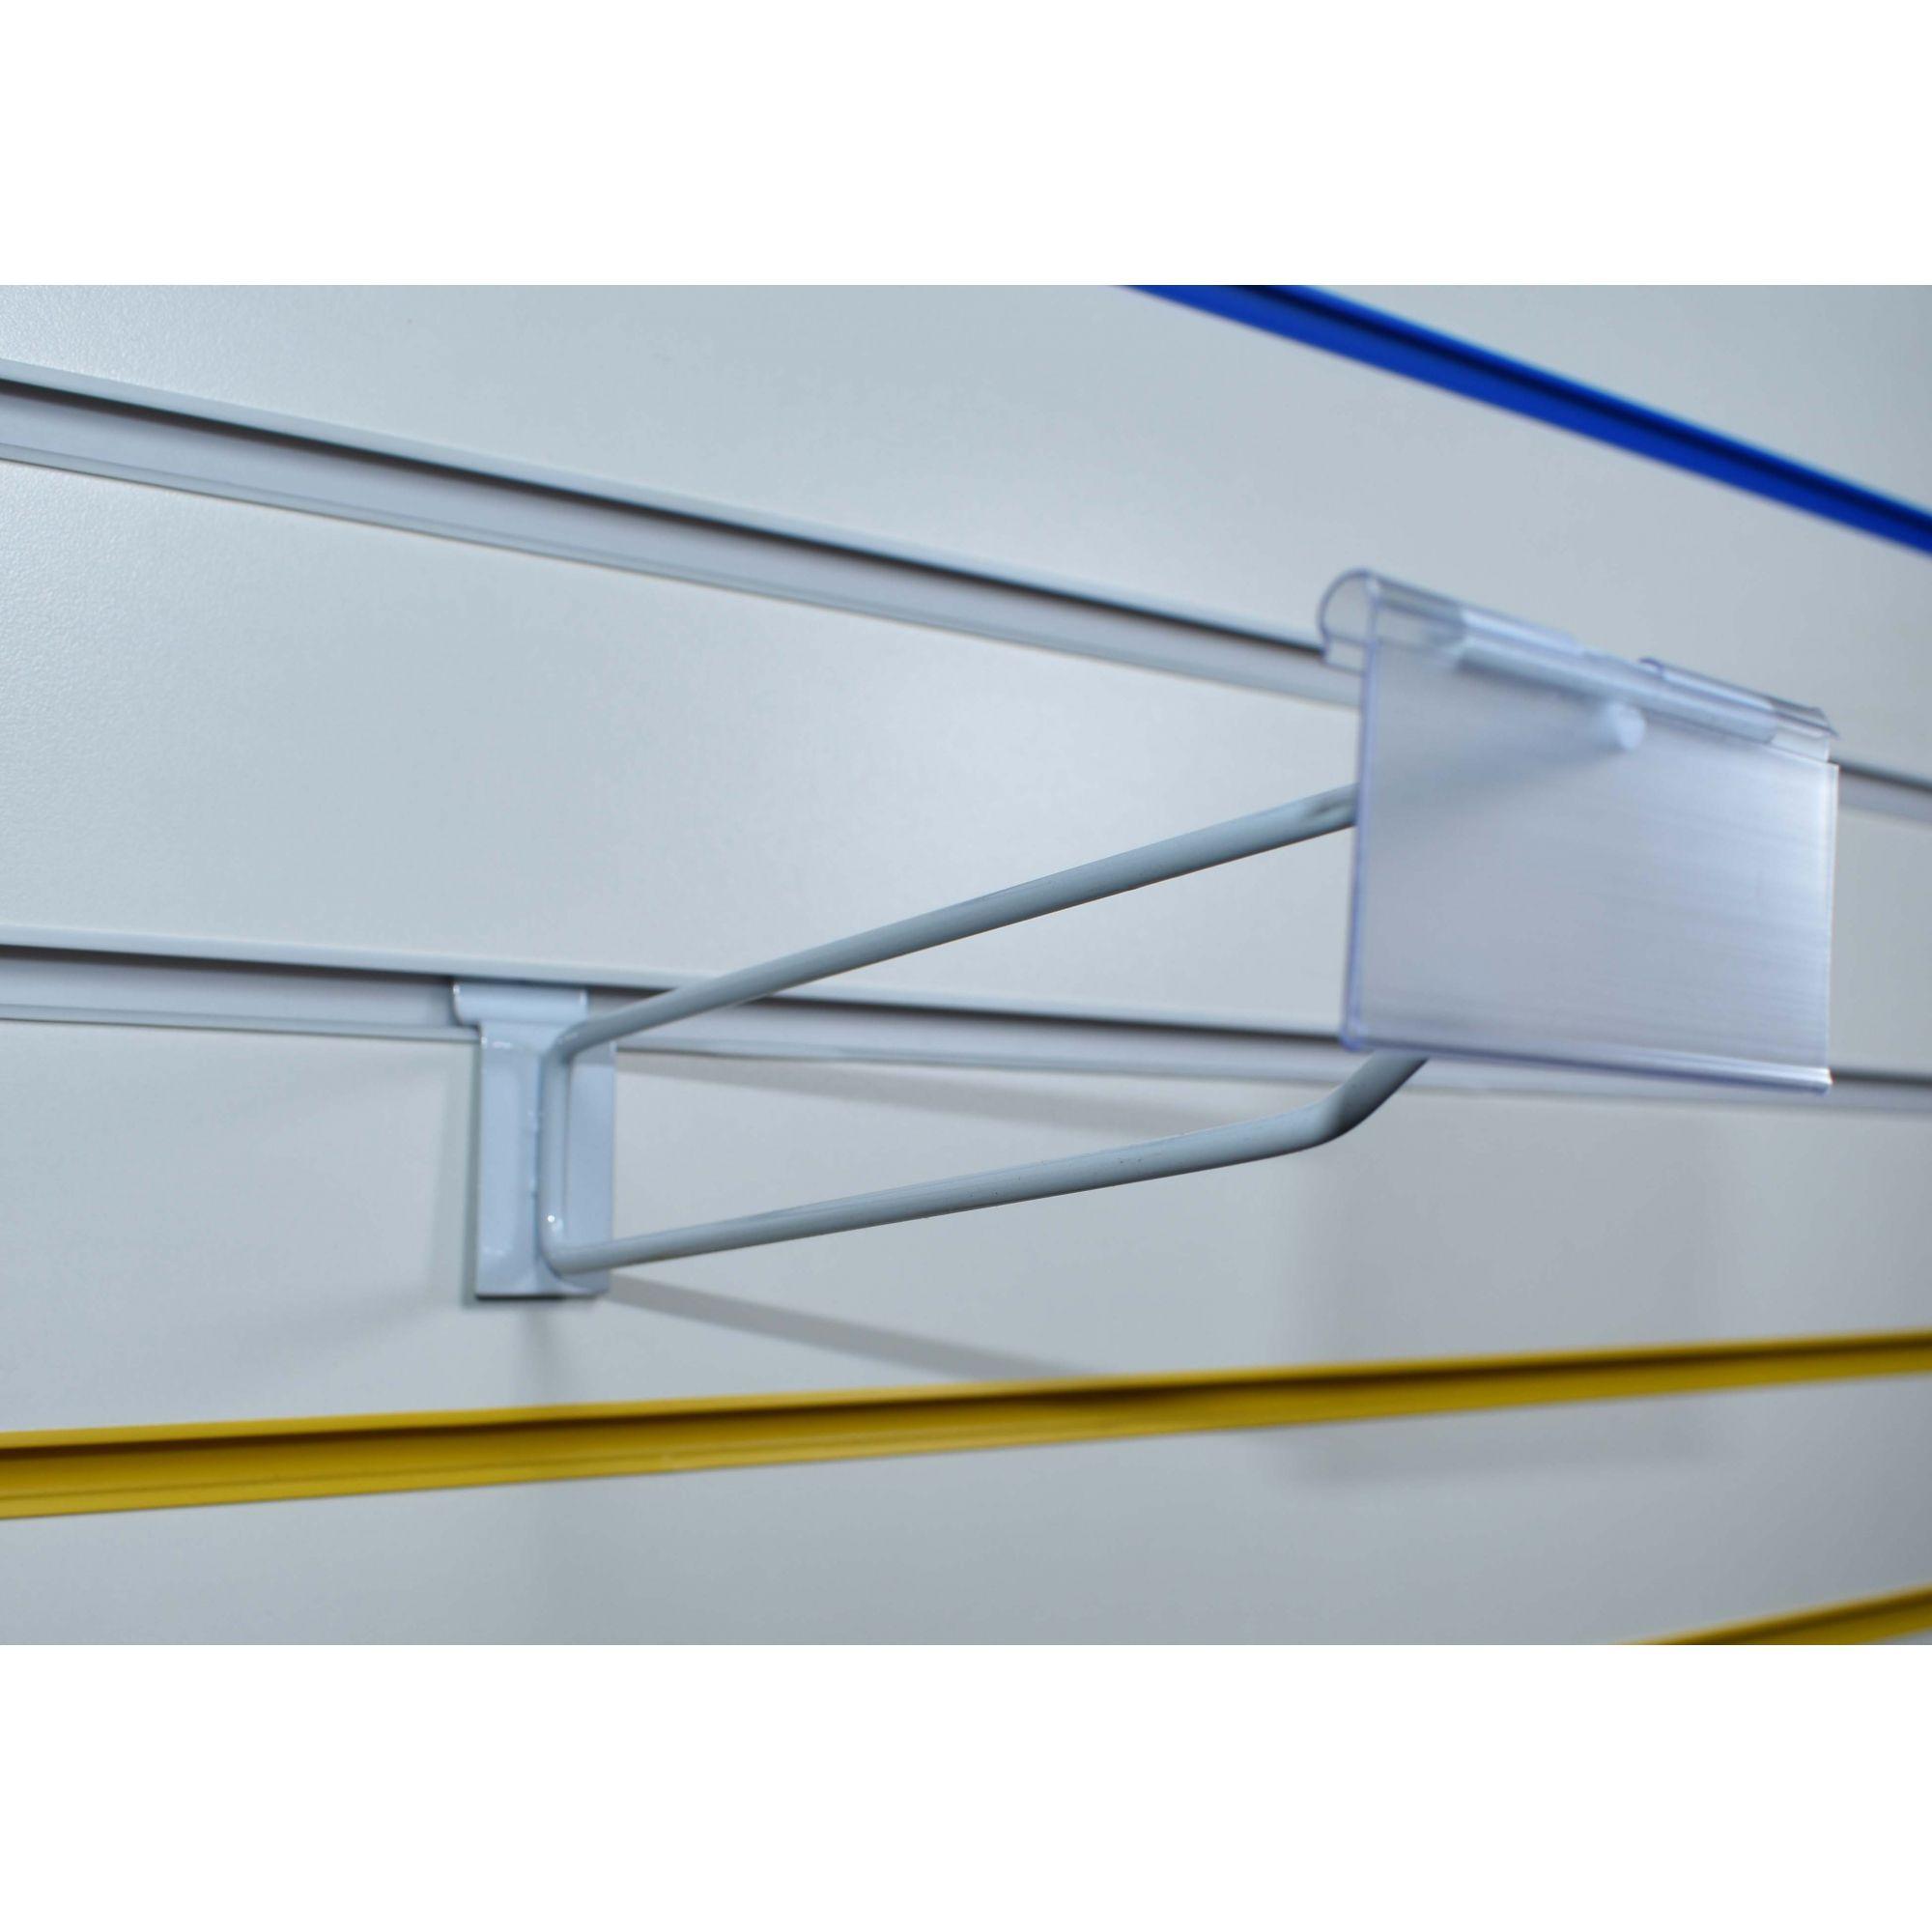 Pegboard c/ porta preço p/ painel canaletado